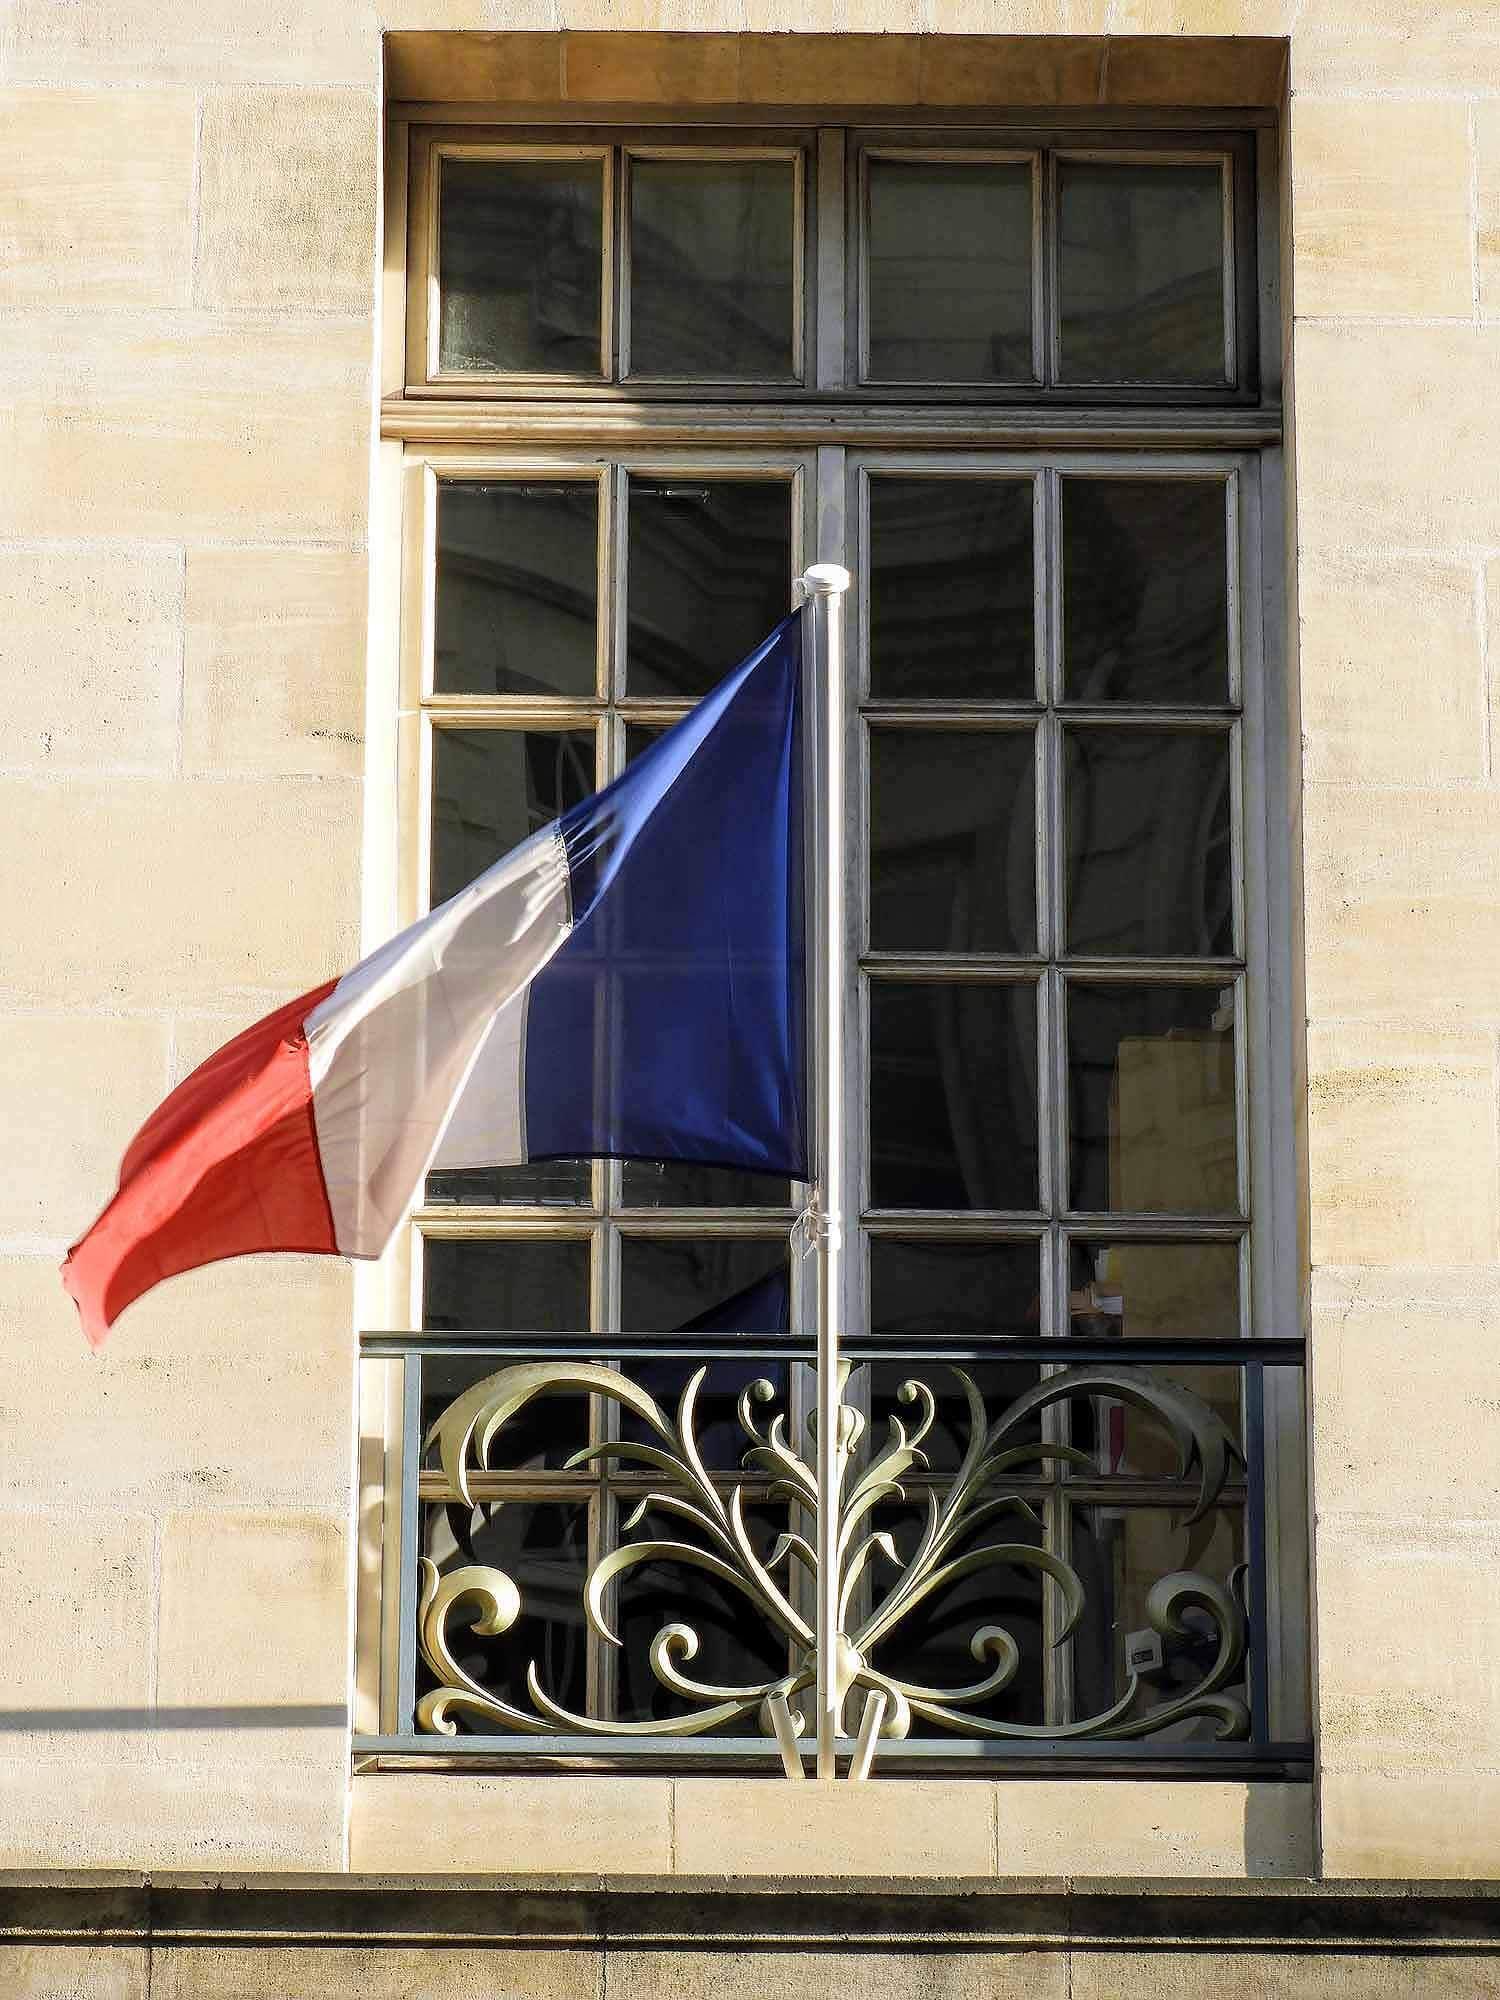 france-nancy-french-flag-window.jpg